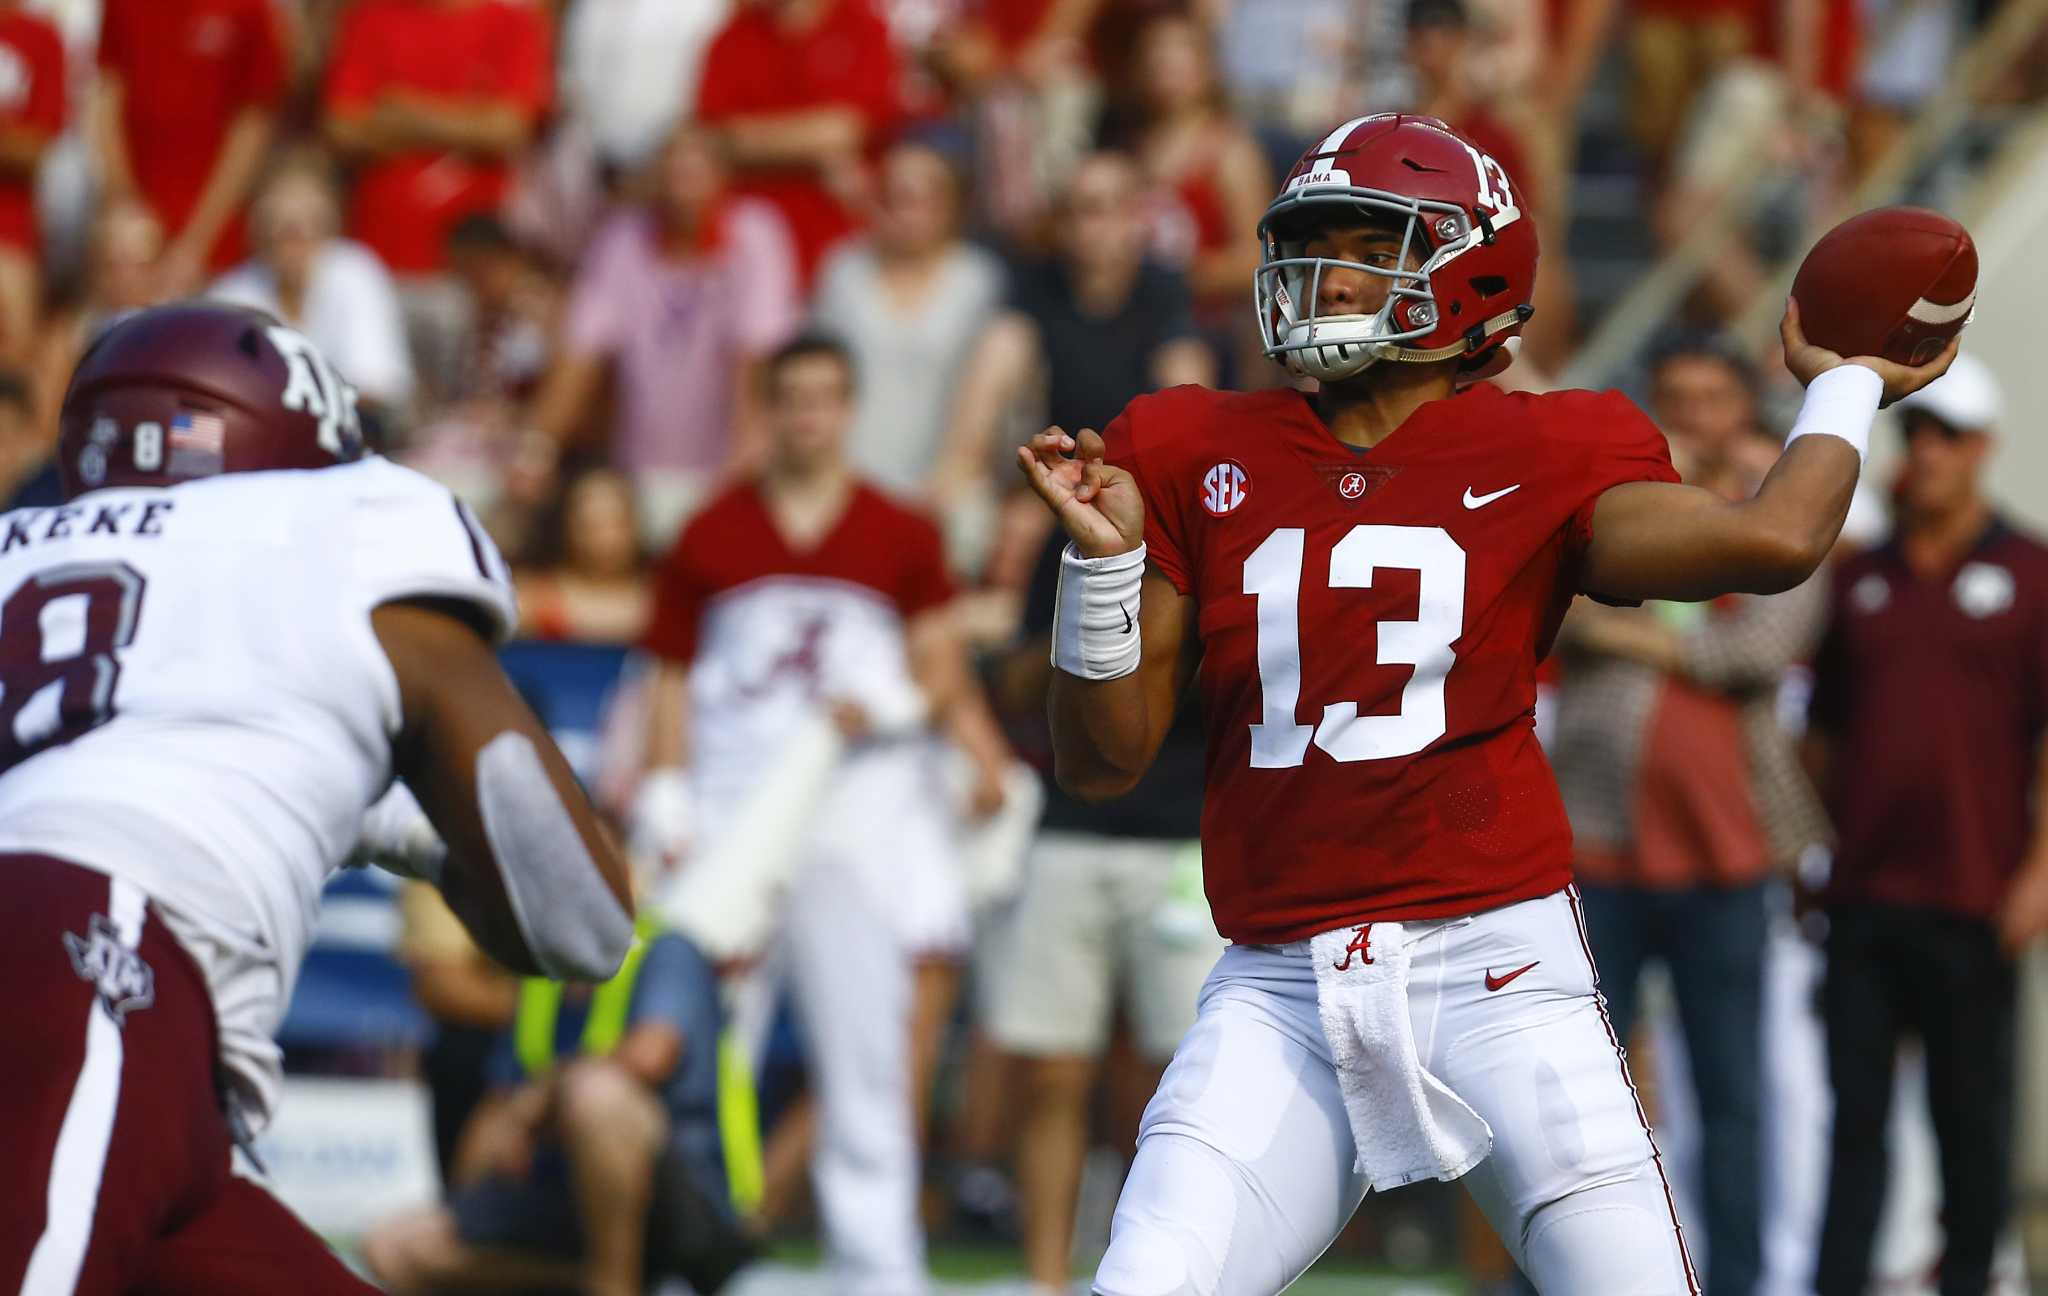 SEC loaded with high-profile quarterbacks